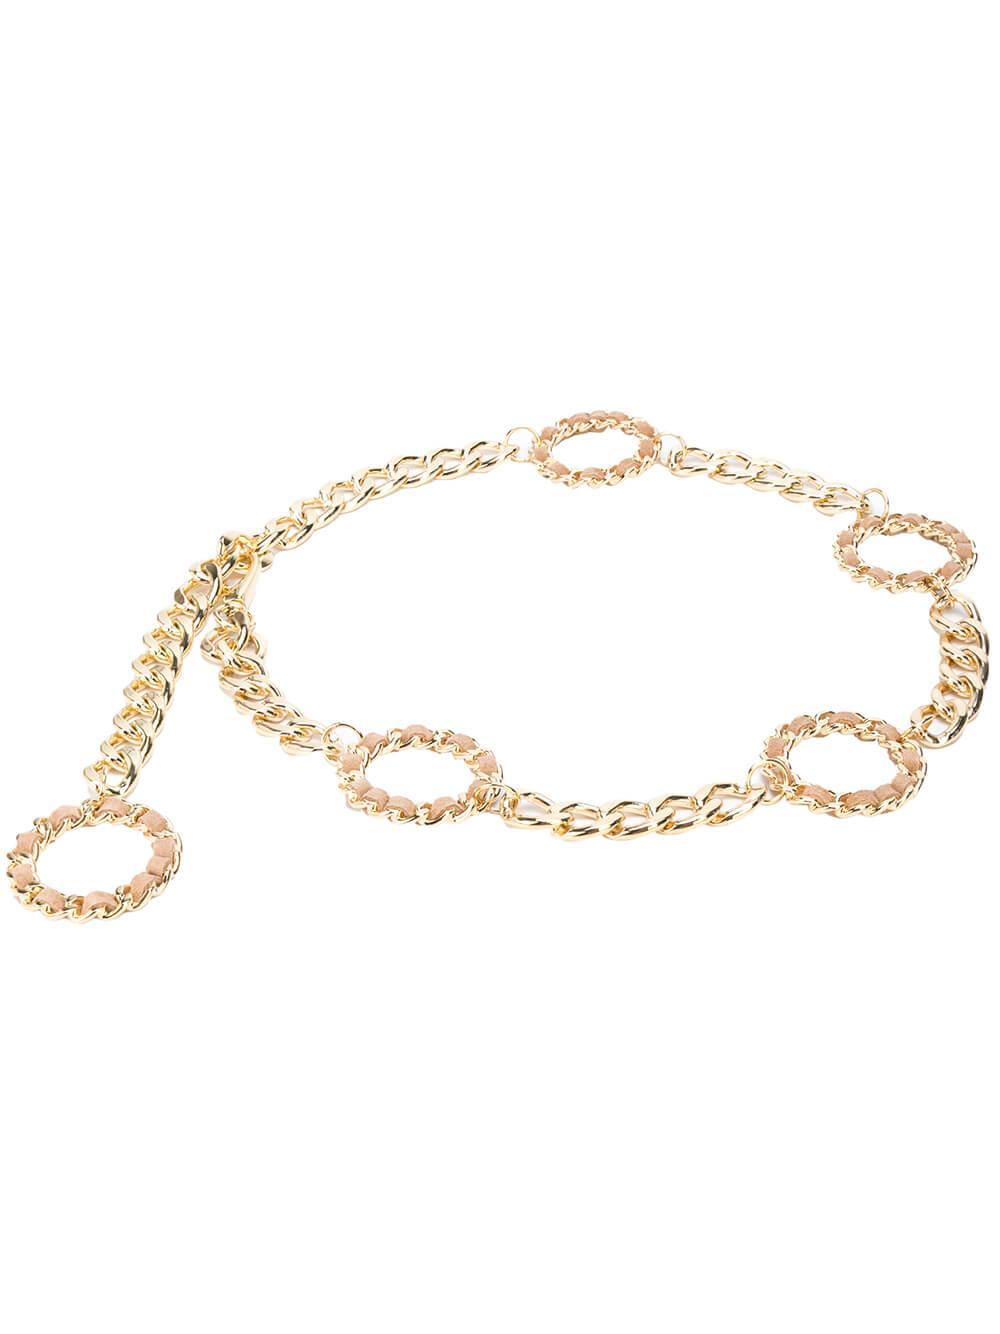 Margaux Circle Chain Belt Item # BW446-455CH-R20